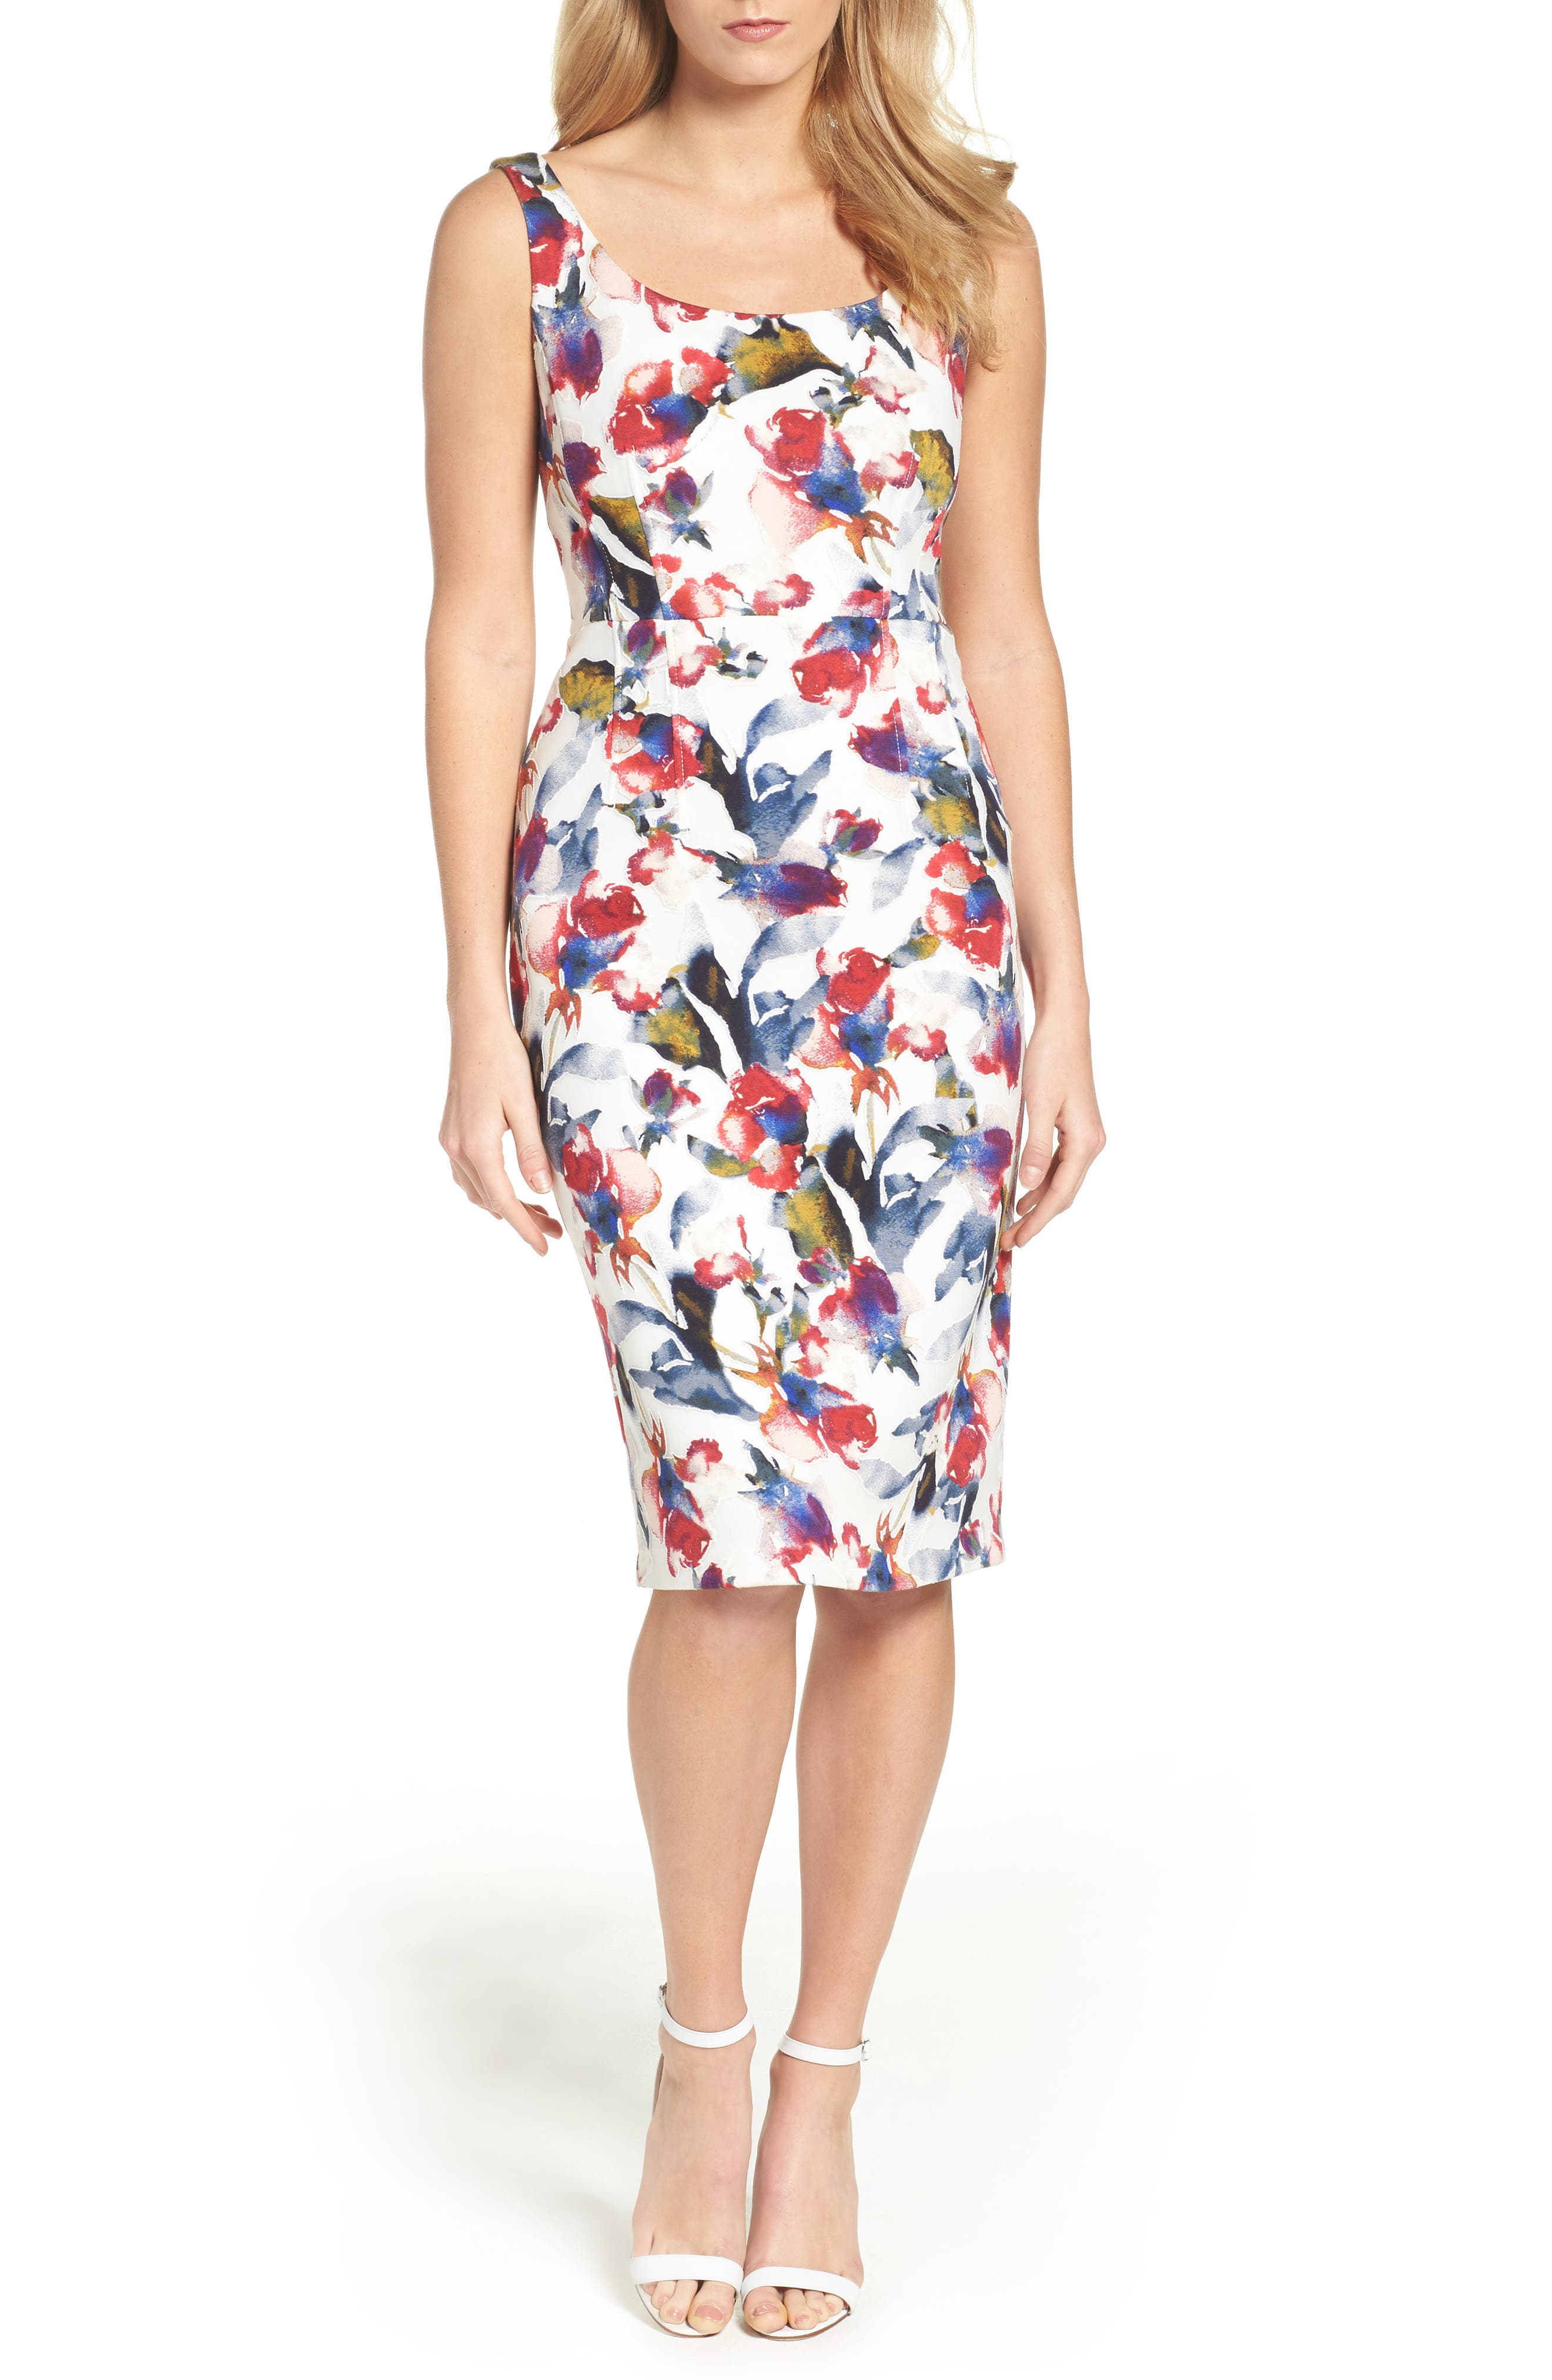 MAGGY LONDON, Tea Rose Dress, Alternate thumbnail 5, color, 145